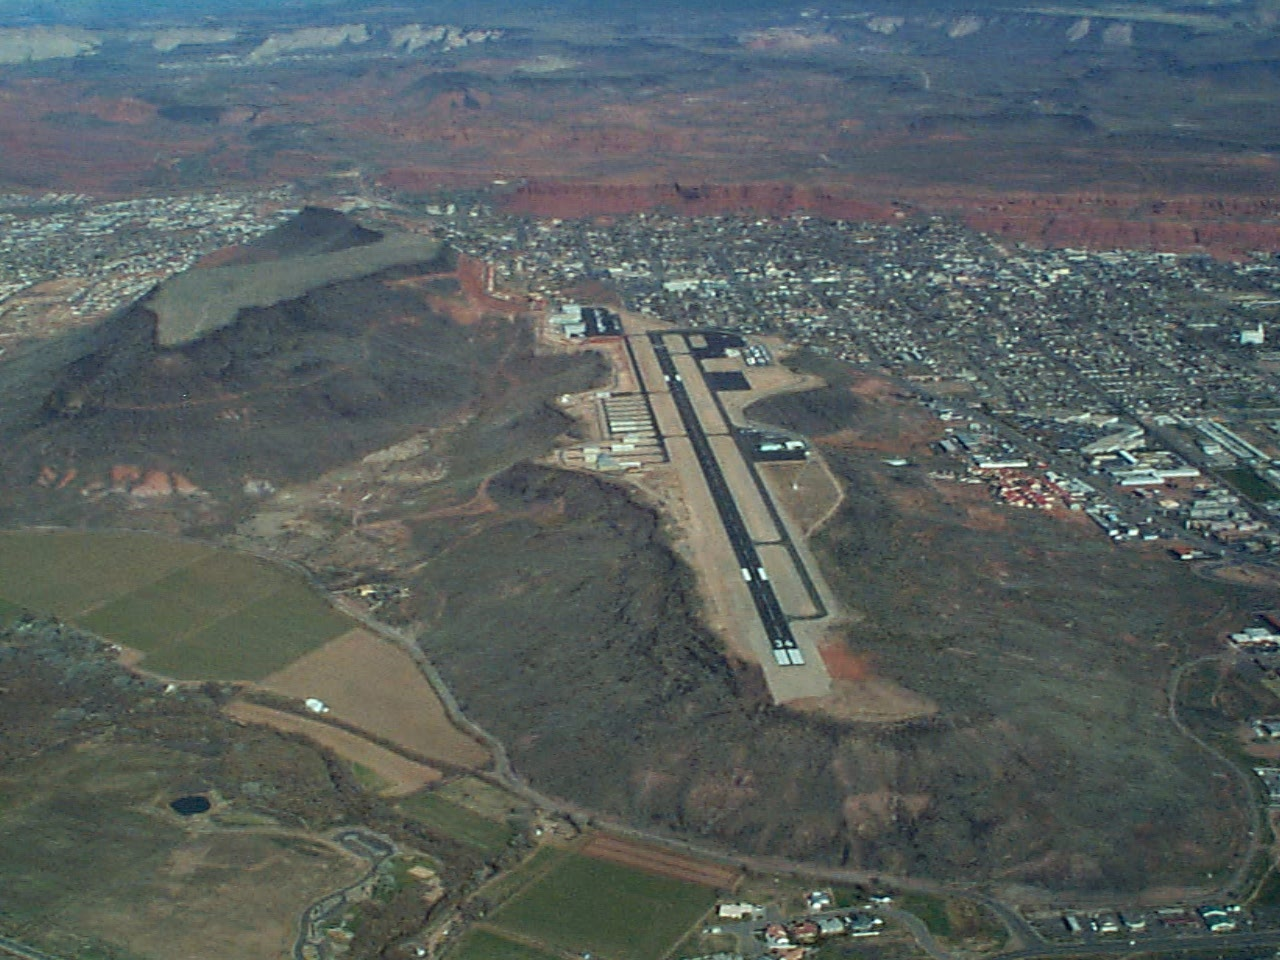 St George Flights| Cheap Tickets to St George Utah SGU Airport